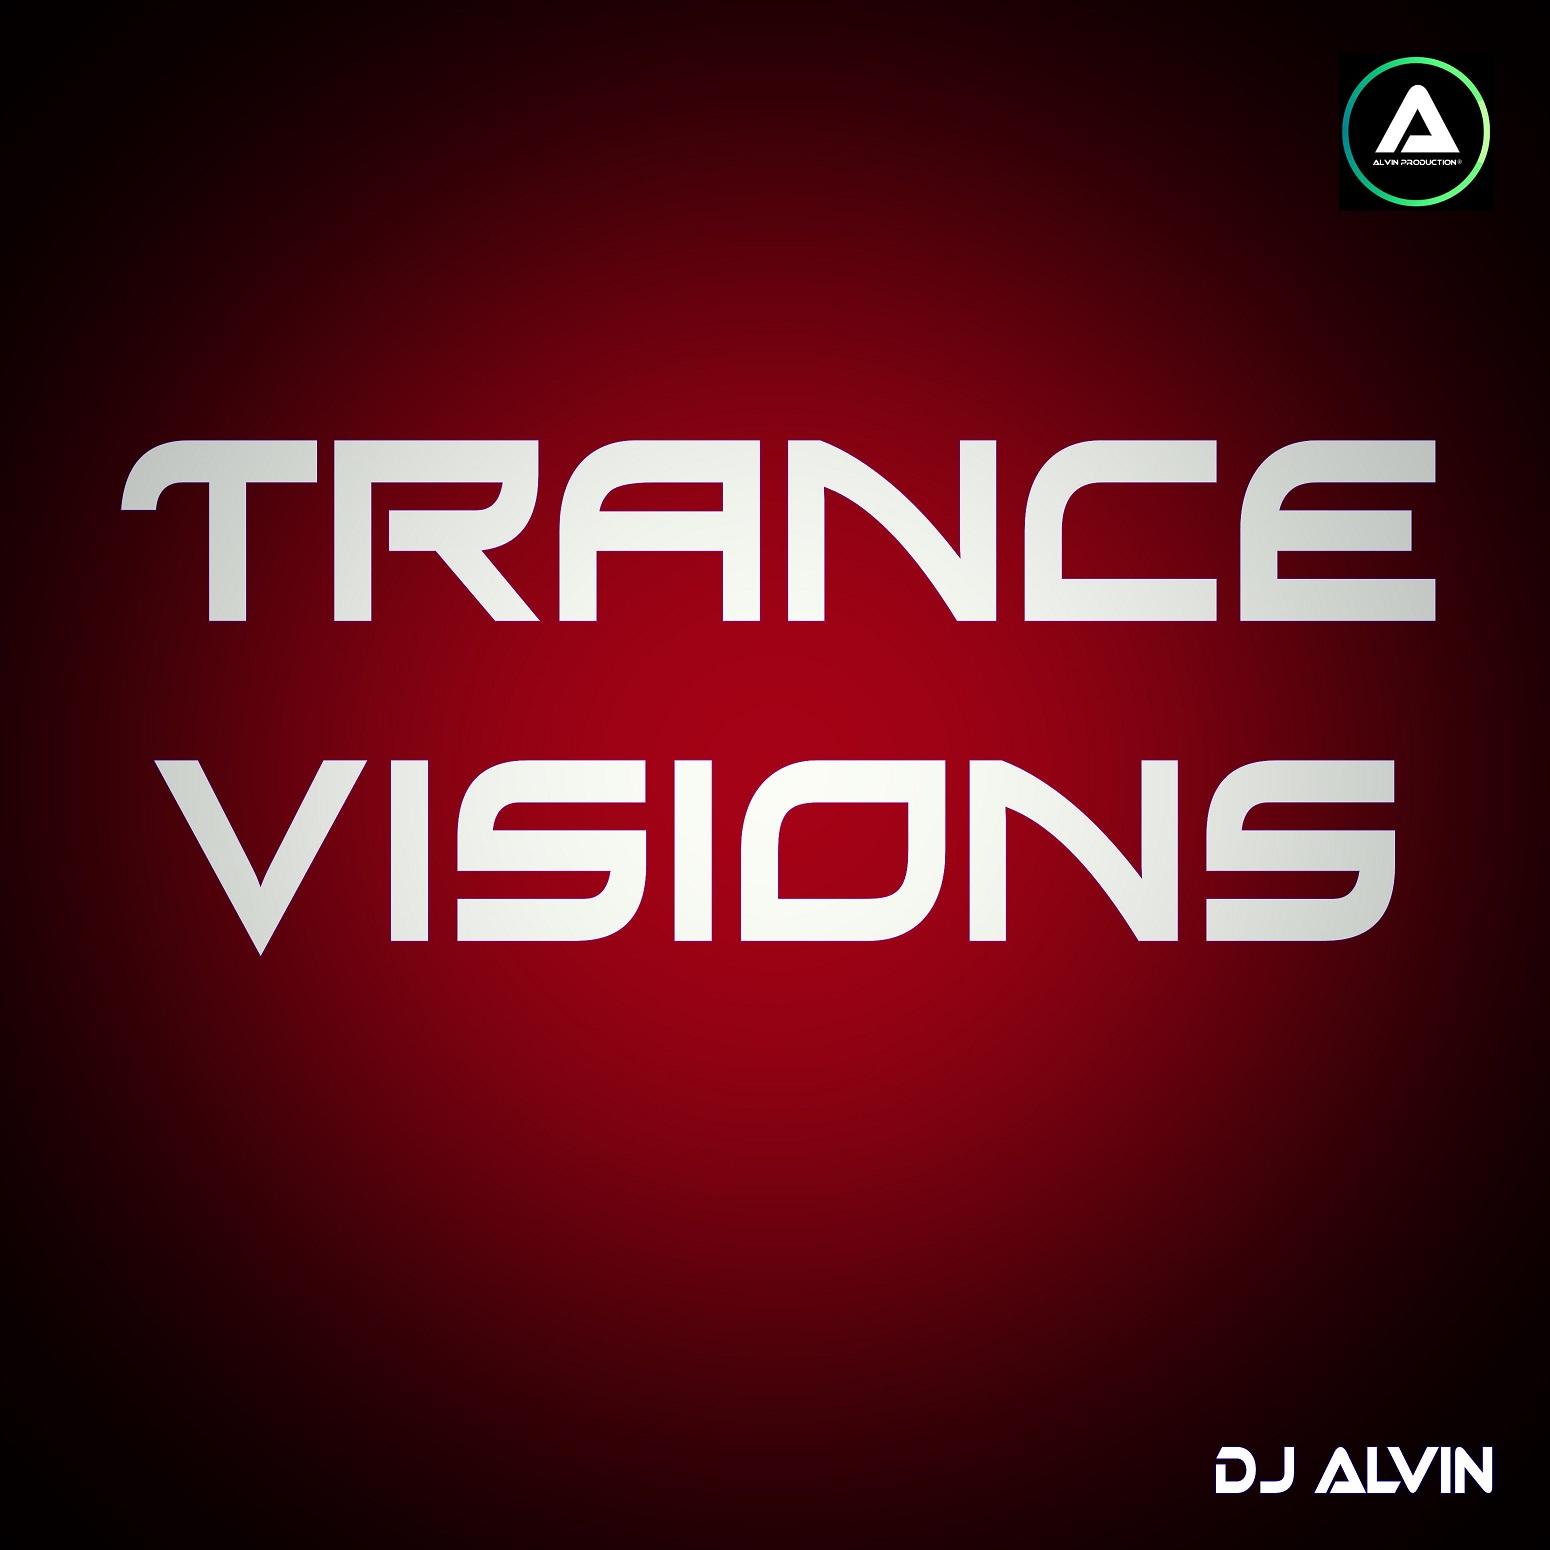 ALVIN-PRODUCTION ® - DJ Alvin - Trance Visions